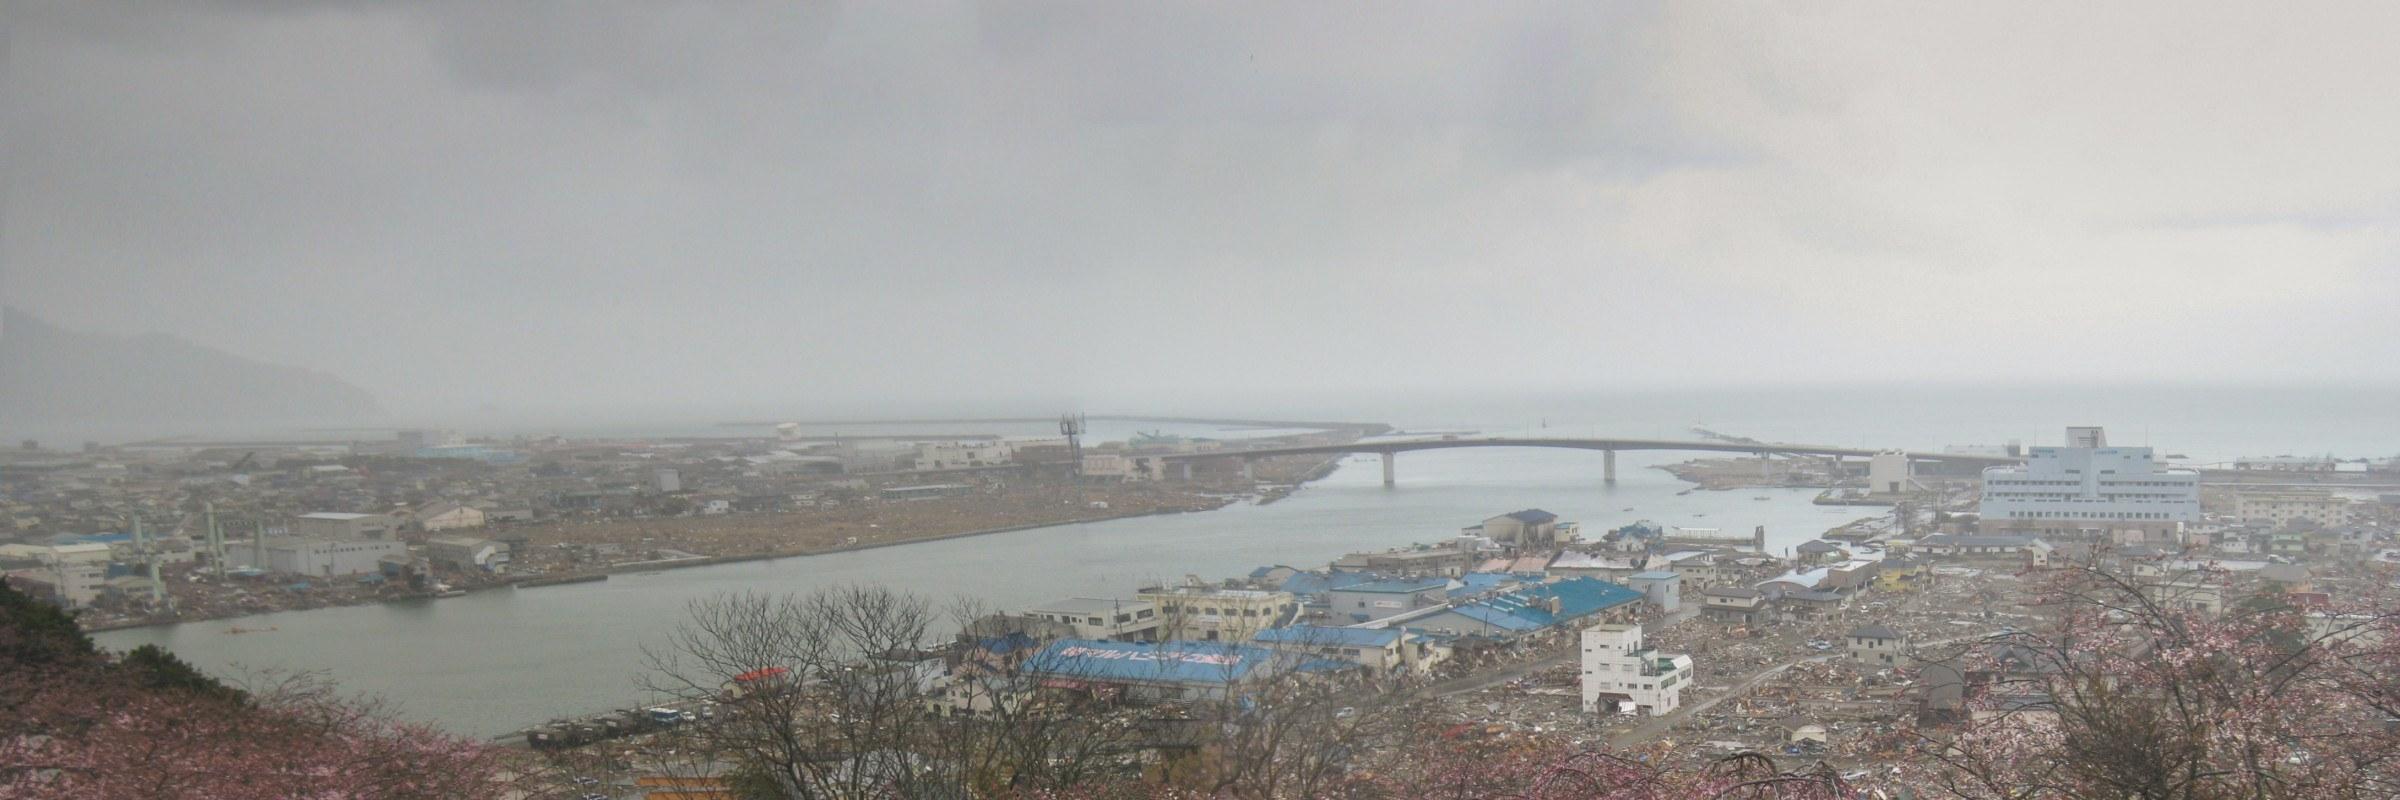 Ishinomaki 2011